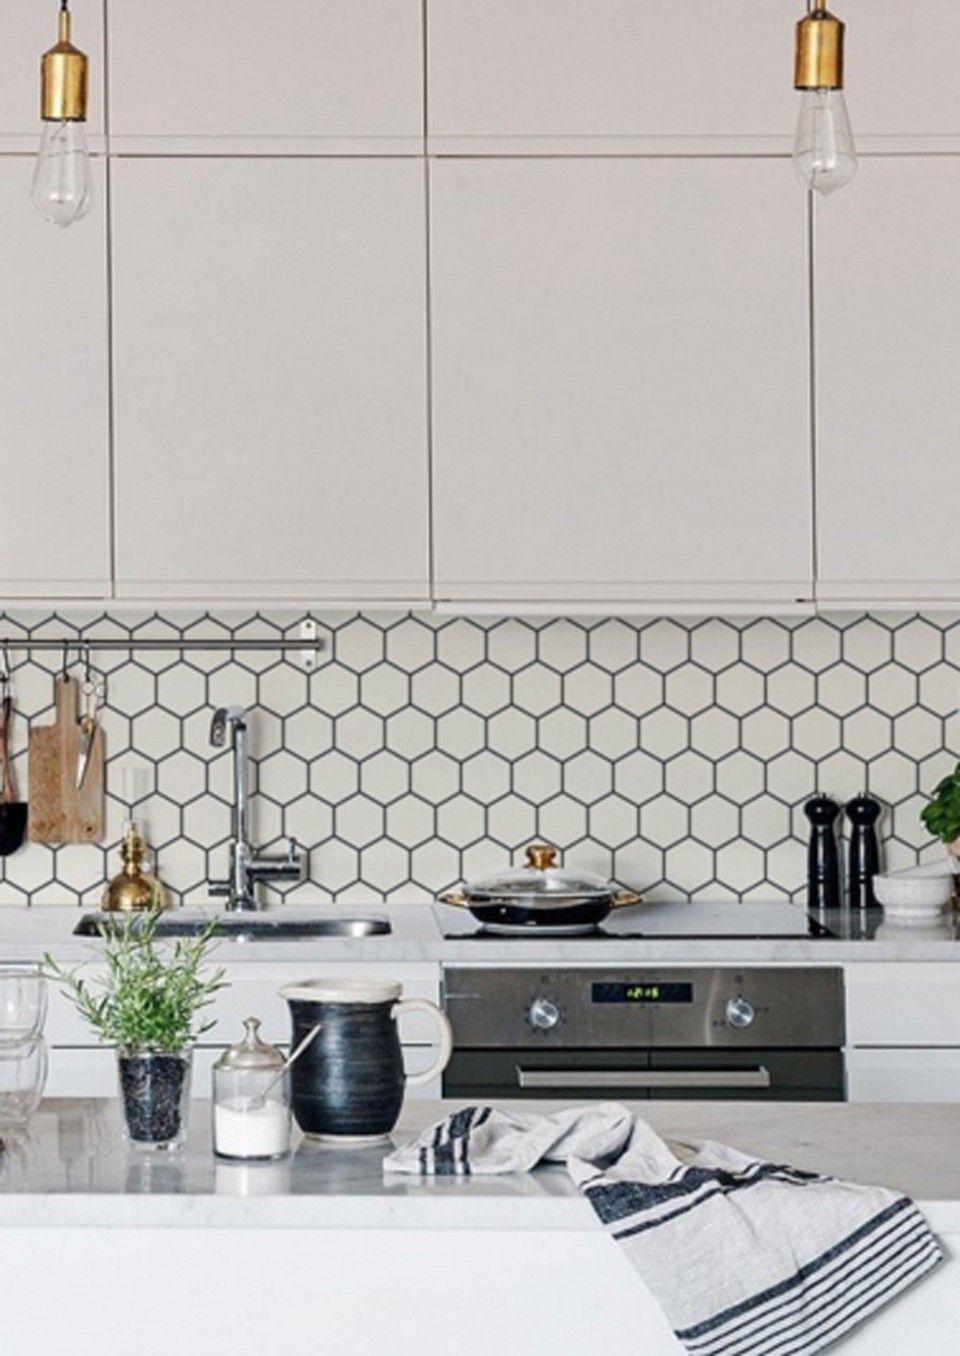 Kitchen Wall Wallpaper Hexagon Kitchen Feature Wall Backsplash Wallpaper Kitchen Wall Decals